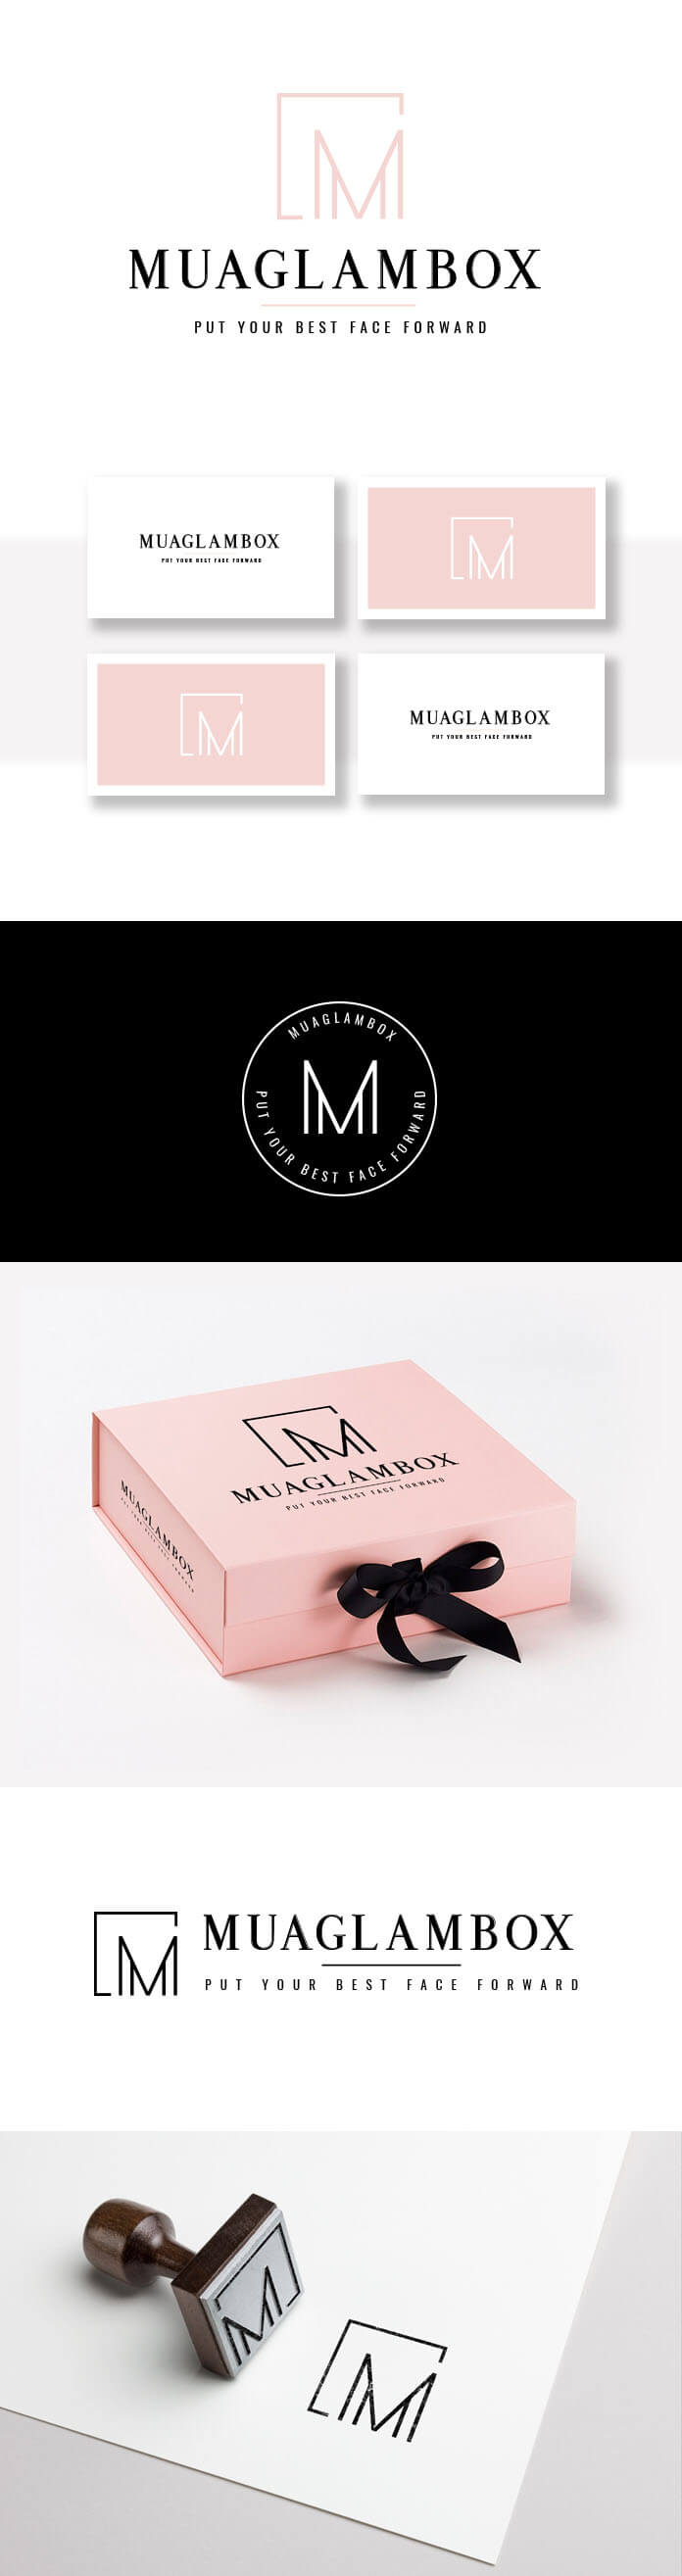 beauty logo design, makeup logo branding, makeup and beauty logo, pink and black logo design, custom logo design clean